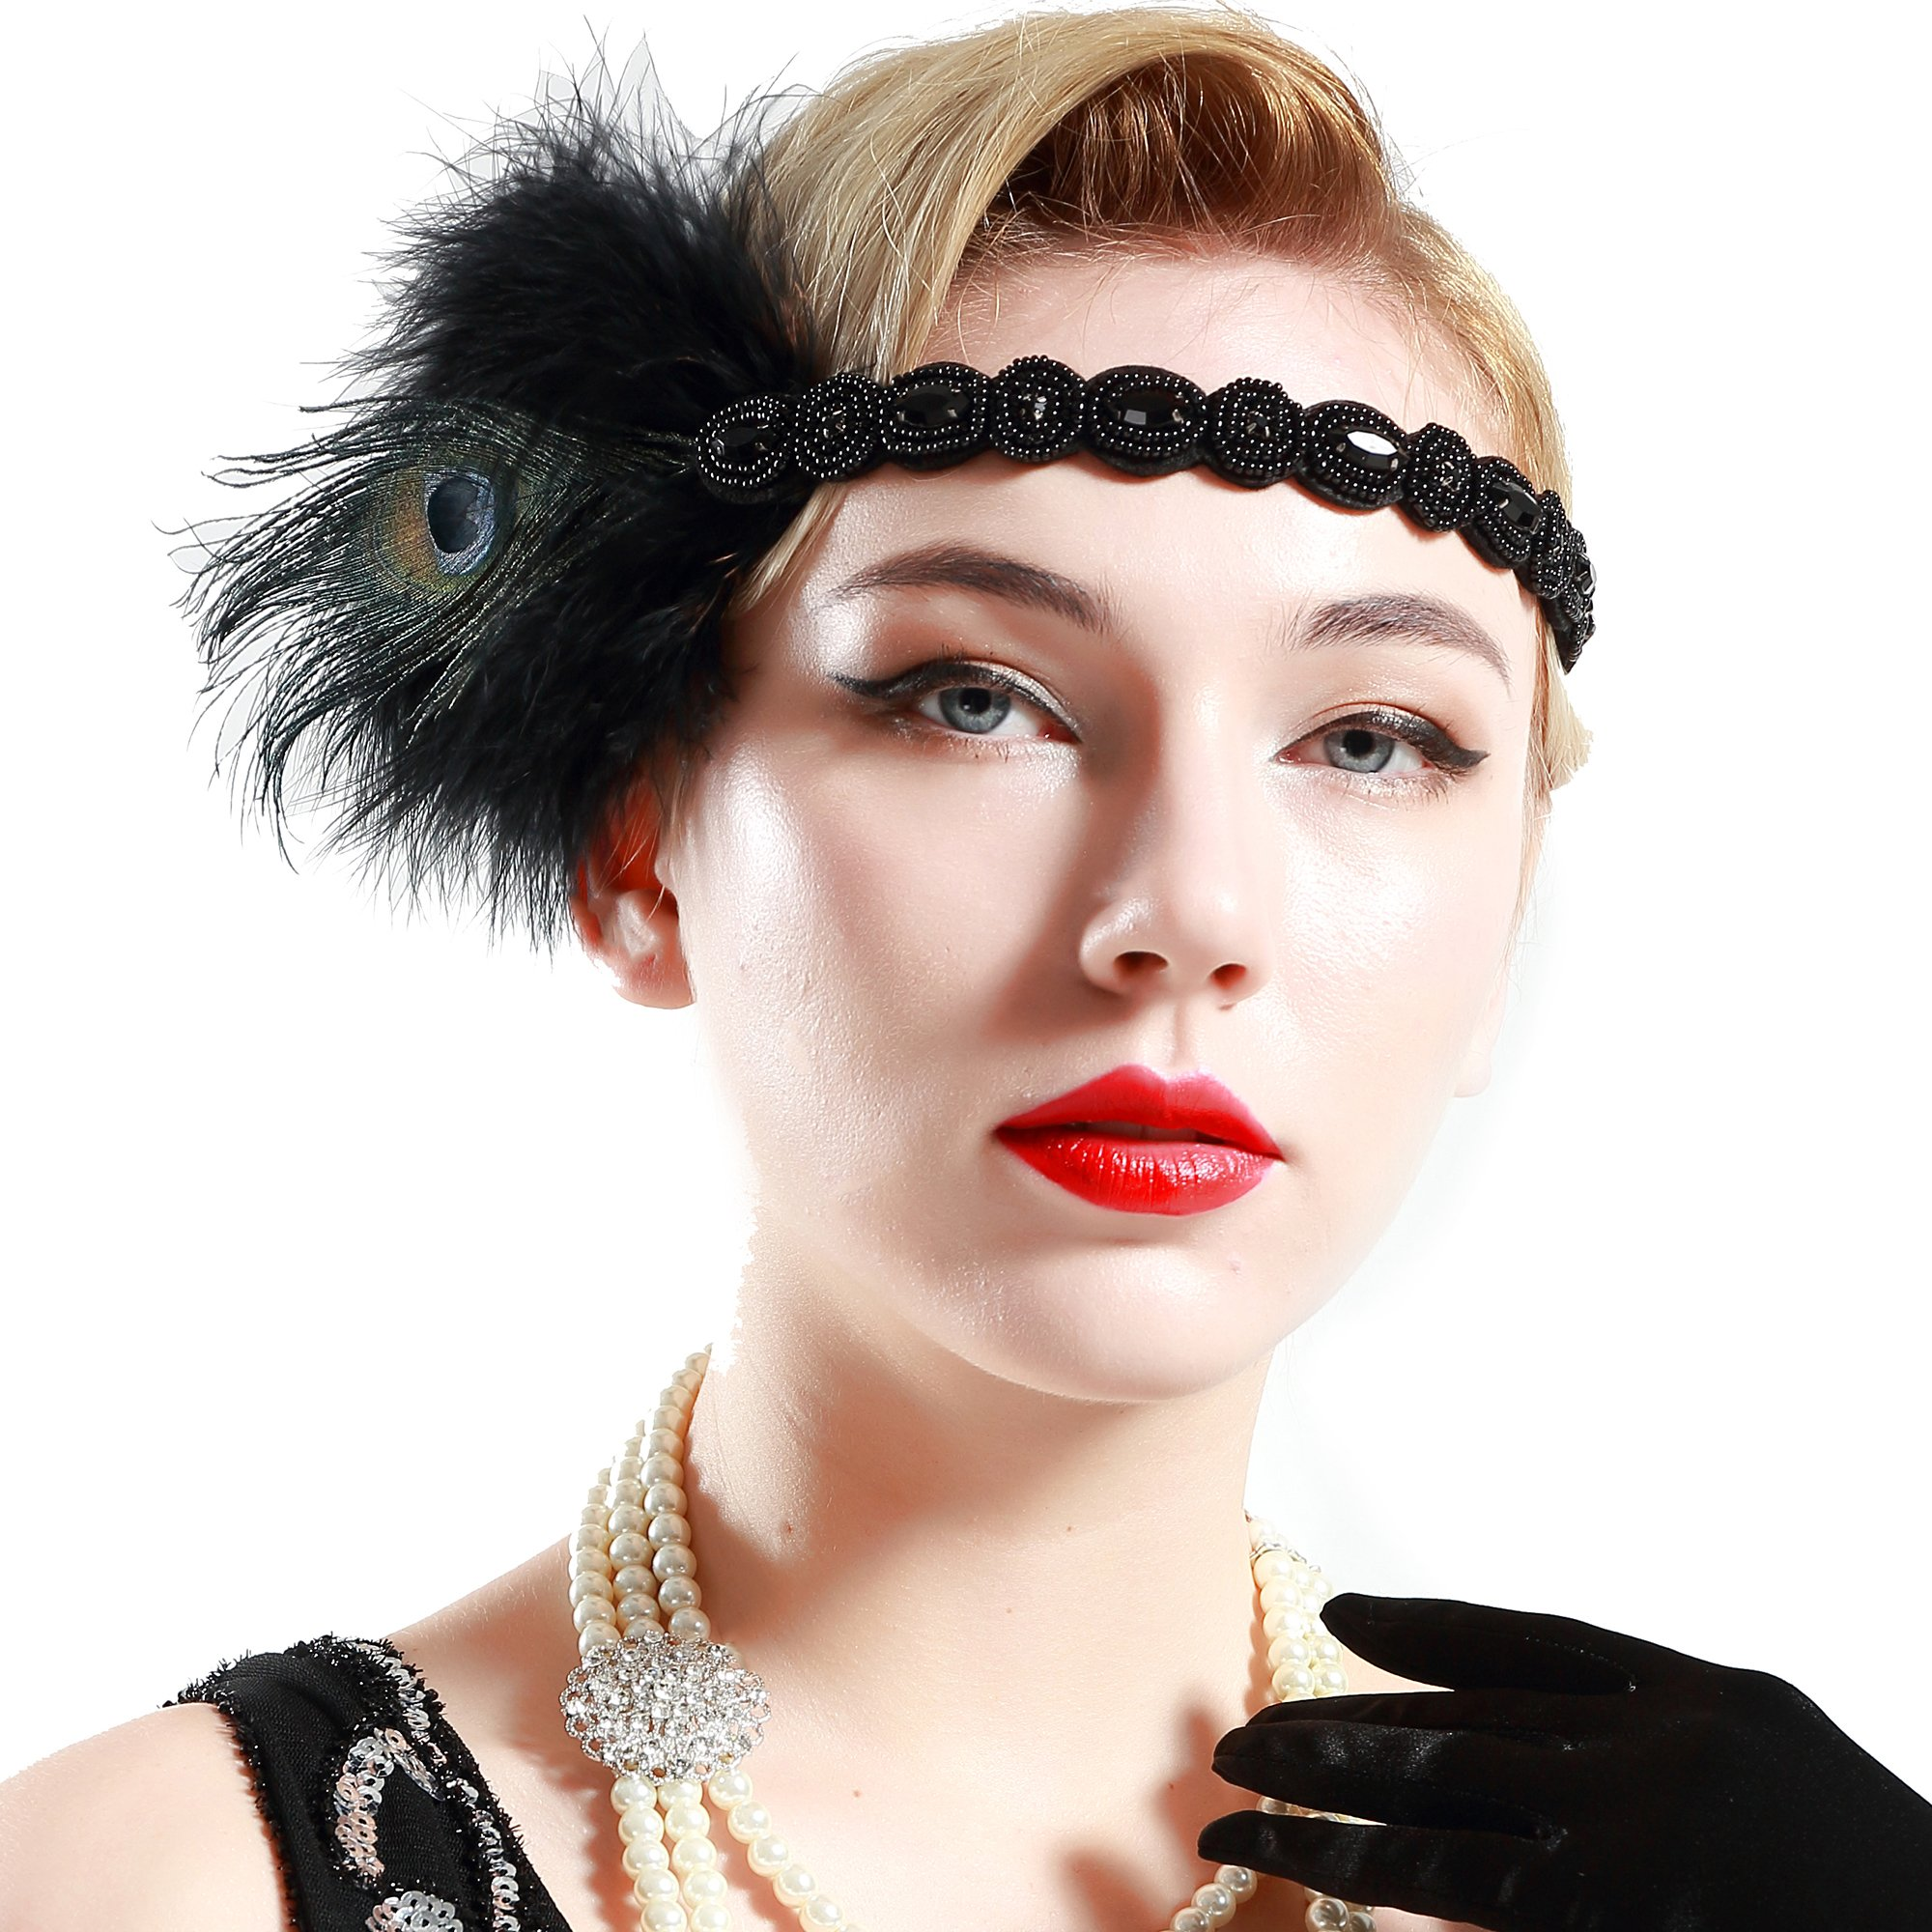 BABEYOND Roaring 20s Headpiece 1920s Flapper Peacock Feather Headband